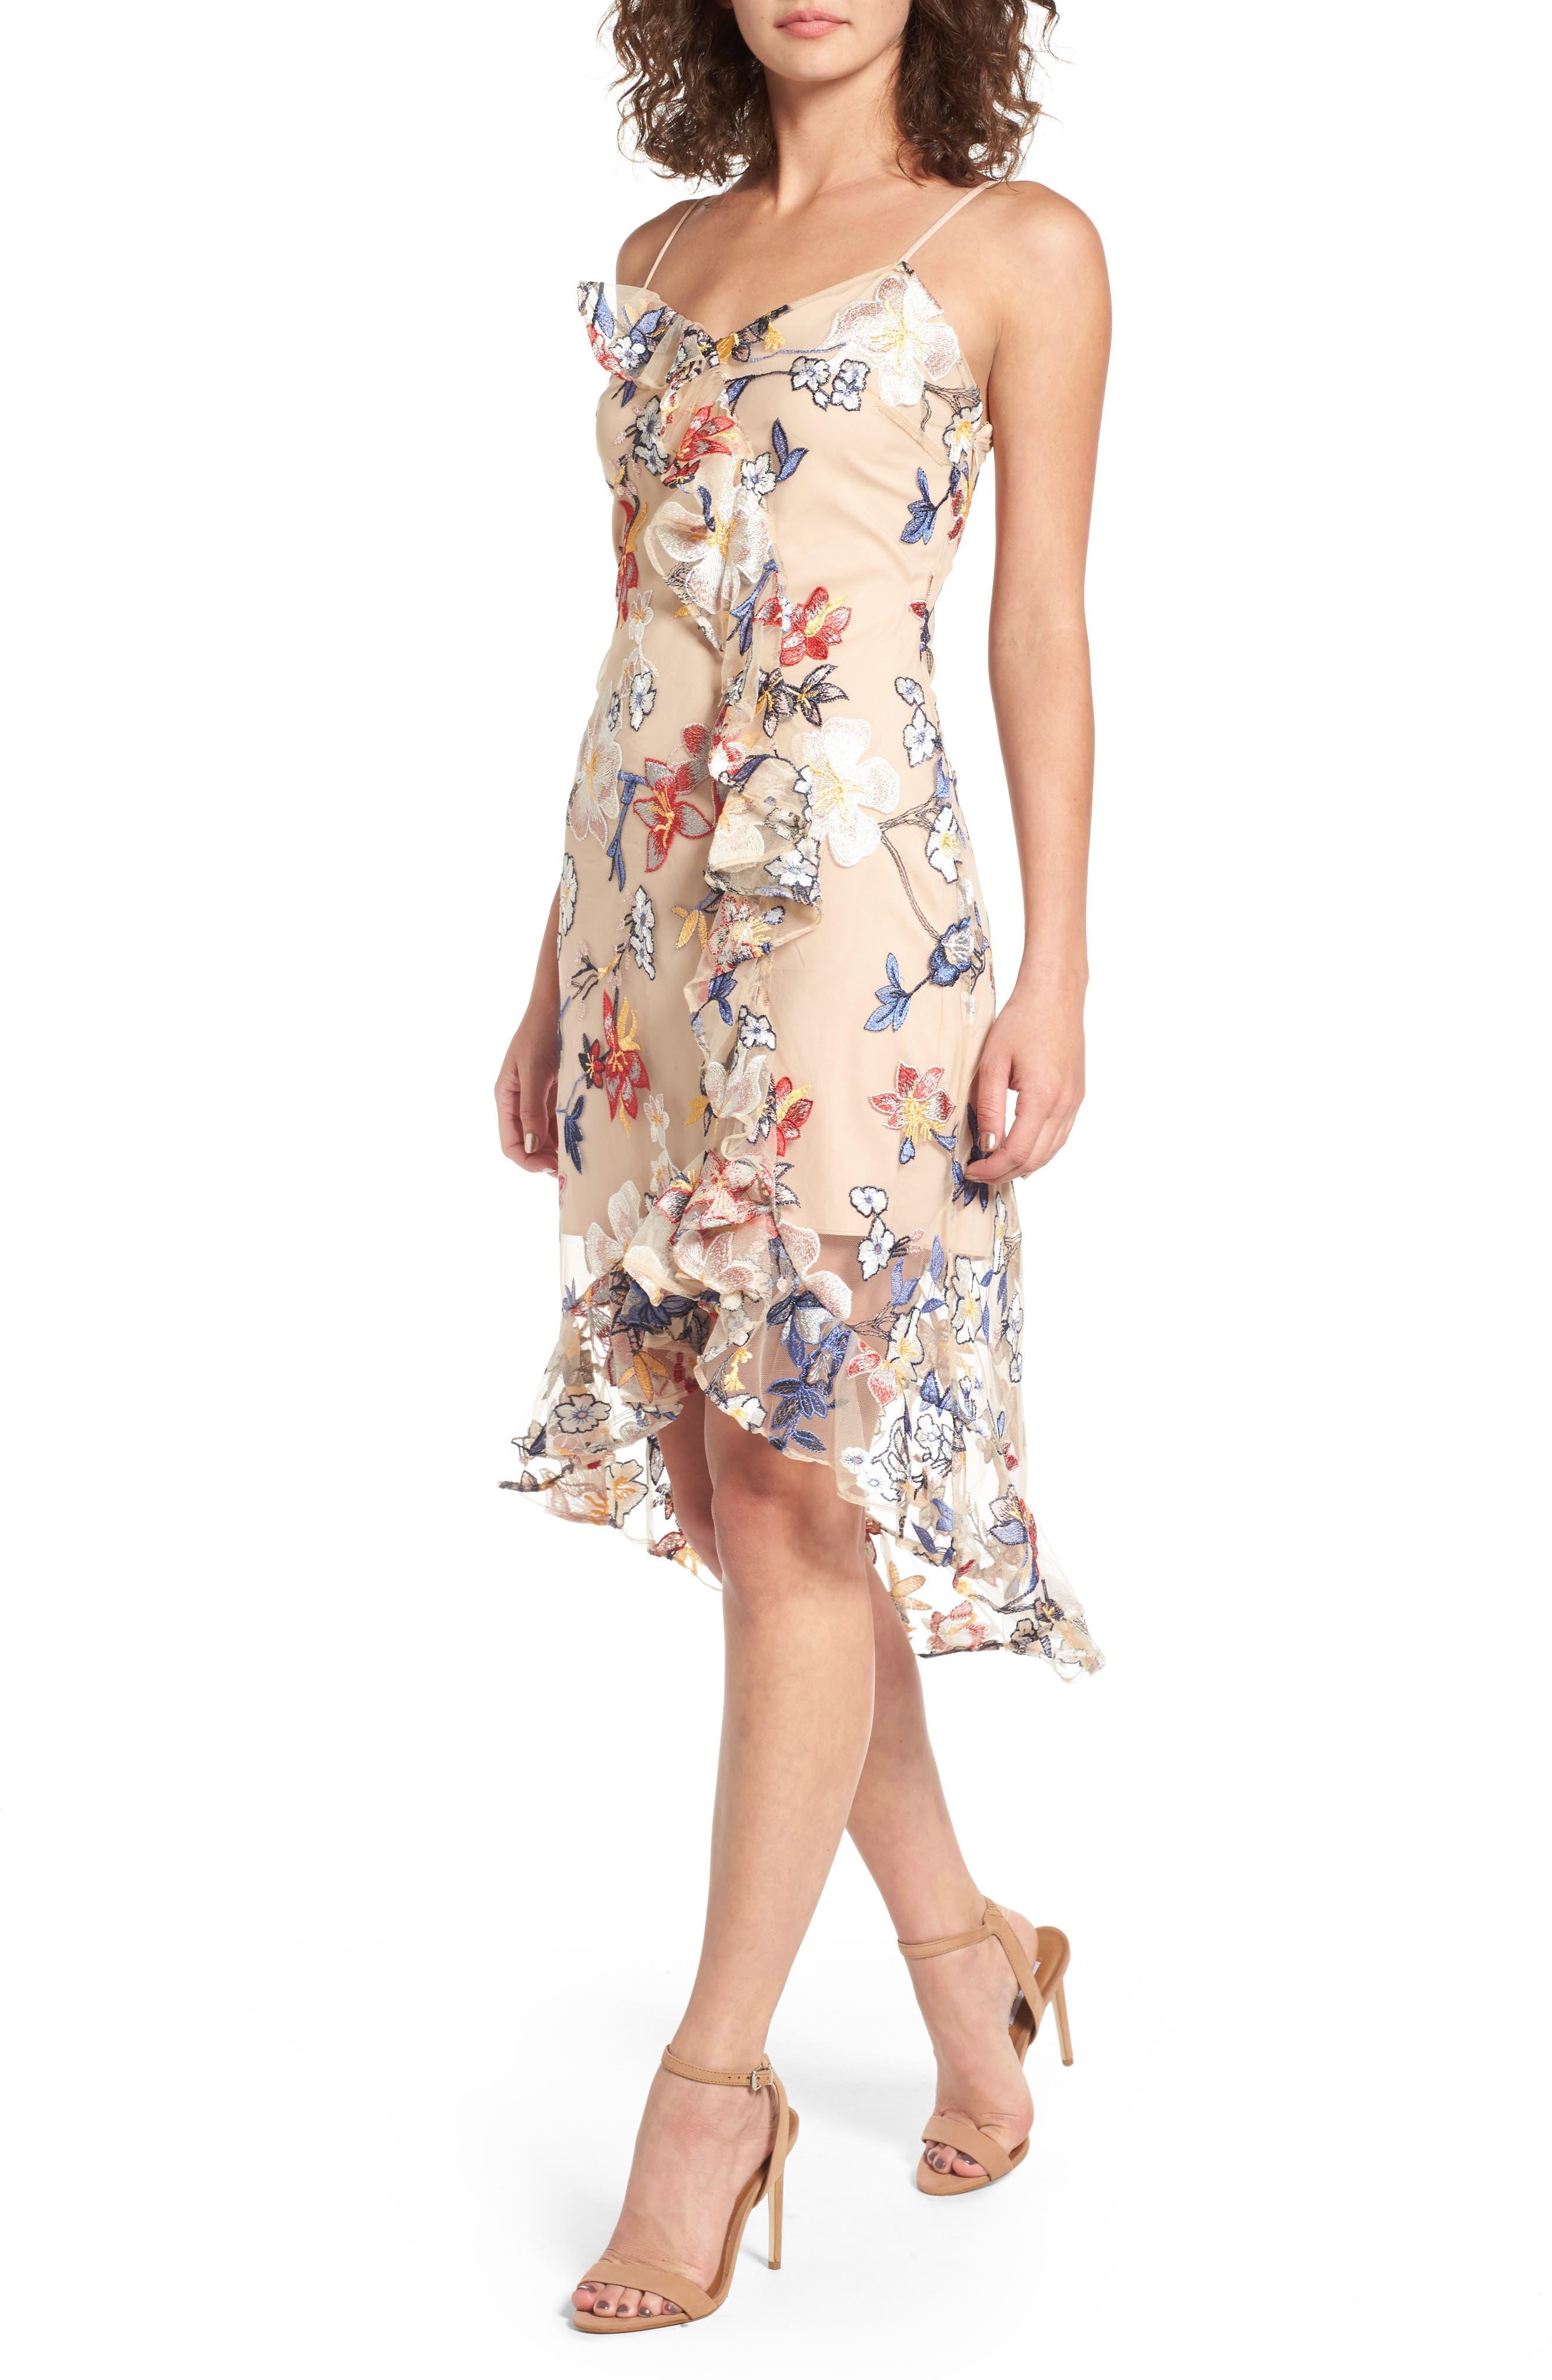 devlin Allyson Embroidered Dress